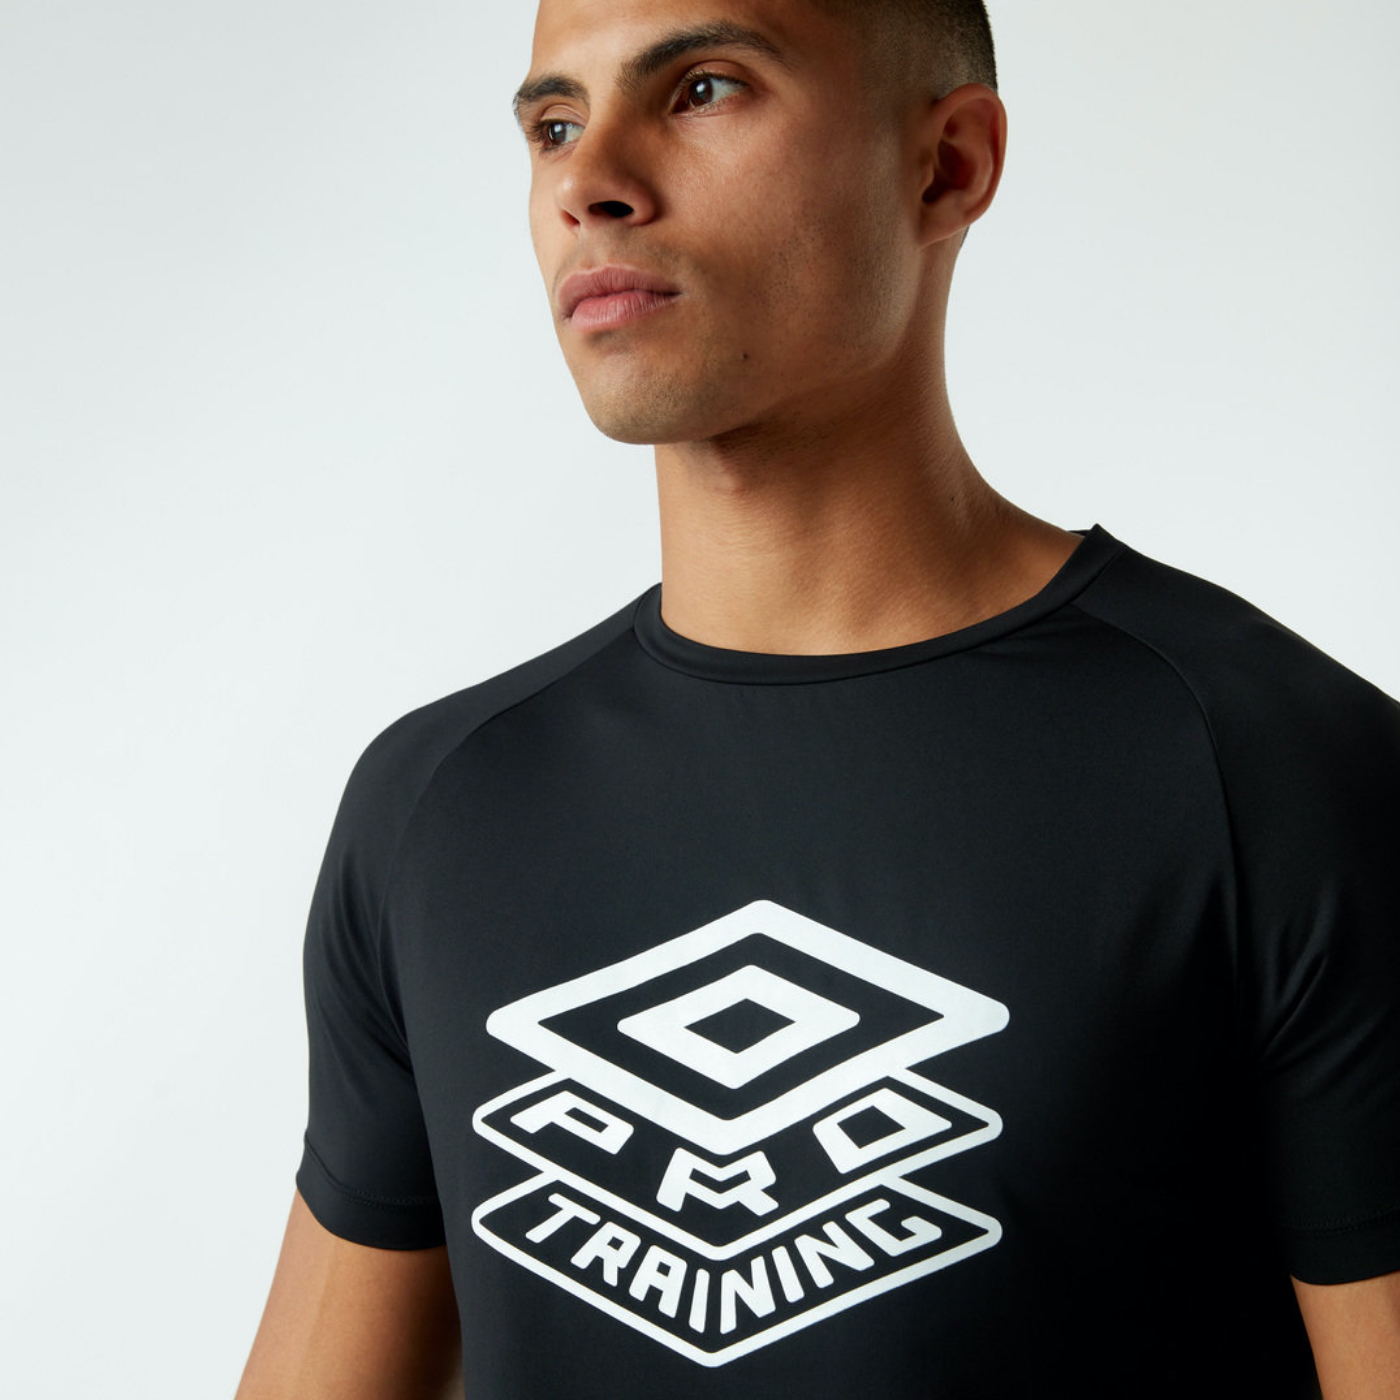 Umbro - Pro Training logo design refresh